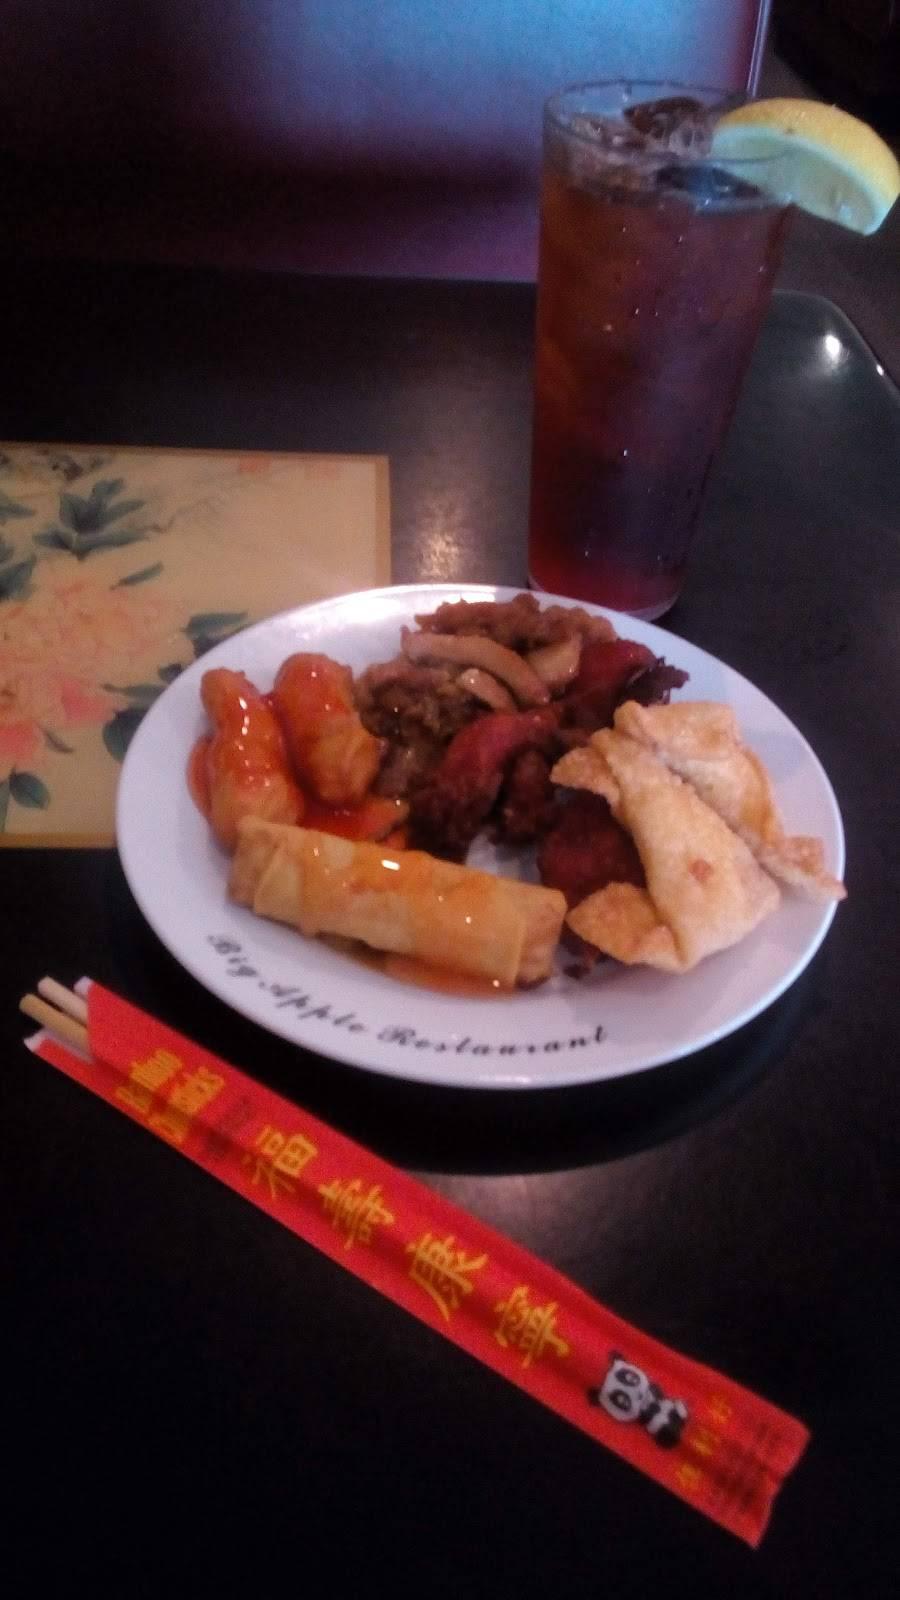 Oriental Restaurant | restaurant | 2005 N Locust Ave, Lawrenceburg, TN 38464, USA | 9317665580 OR +1 931-766-5580